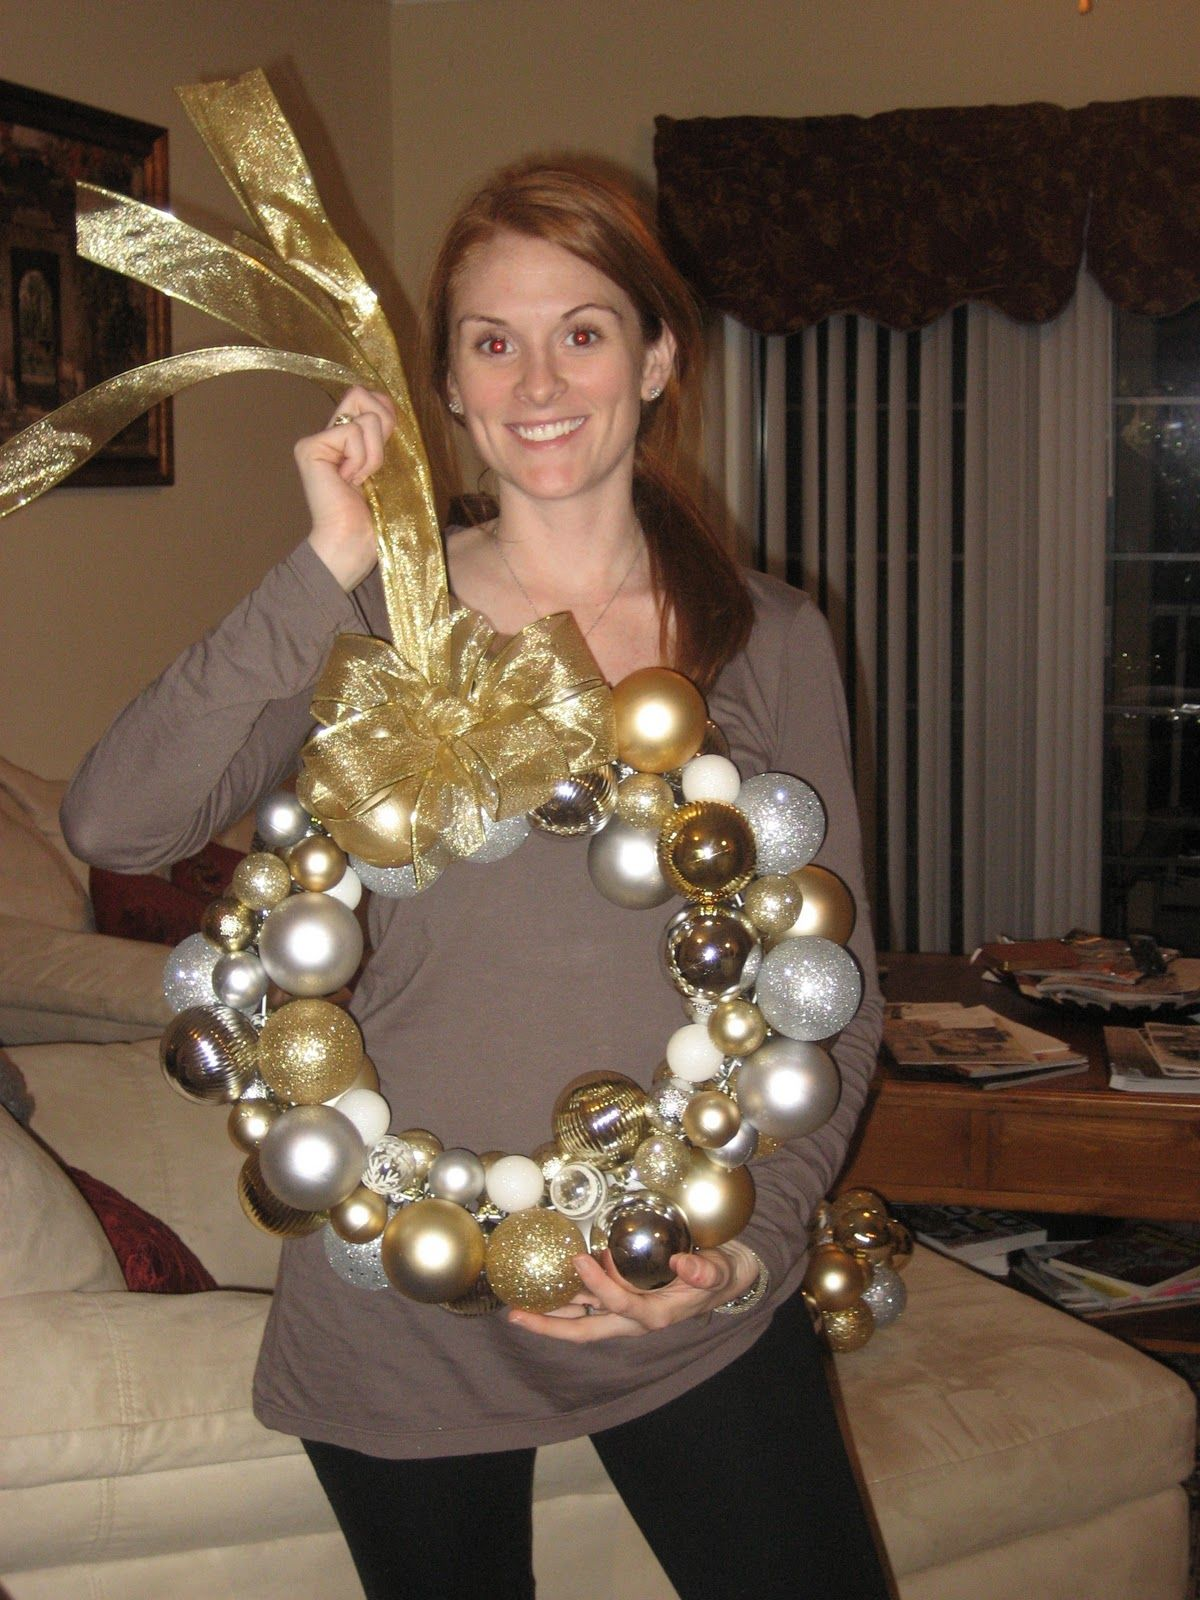 Comfy Cozy Couture DIY Christmas Ornament Wreath tried